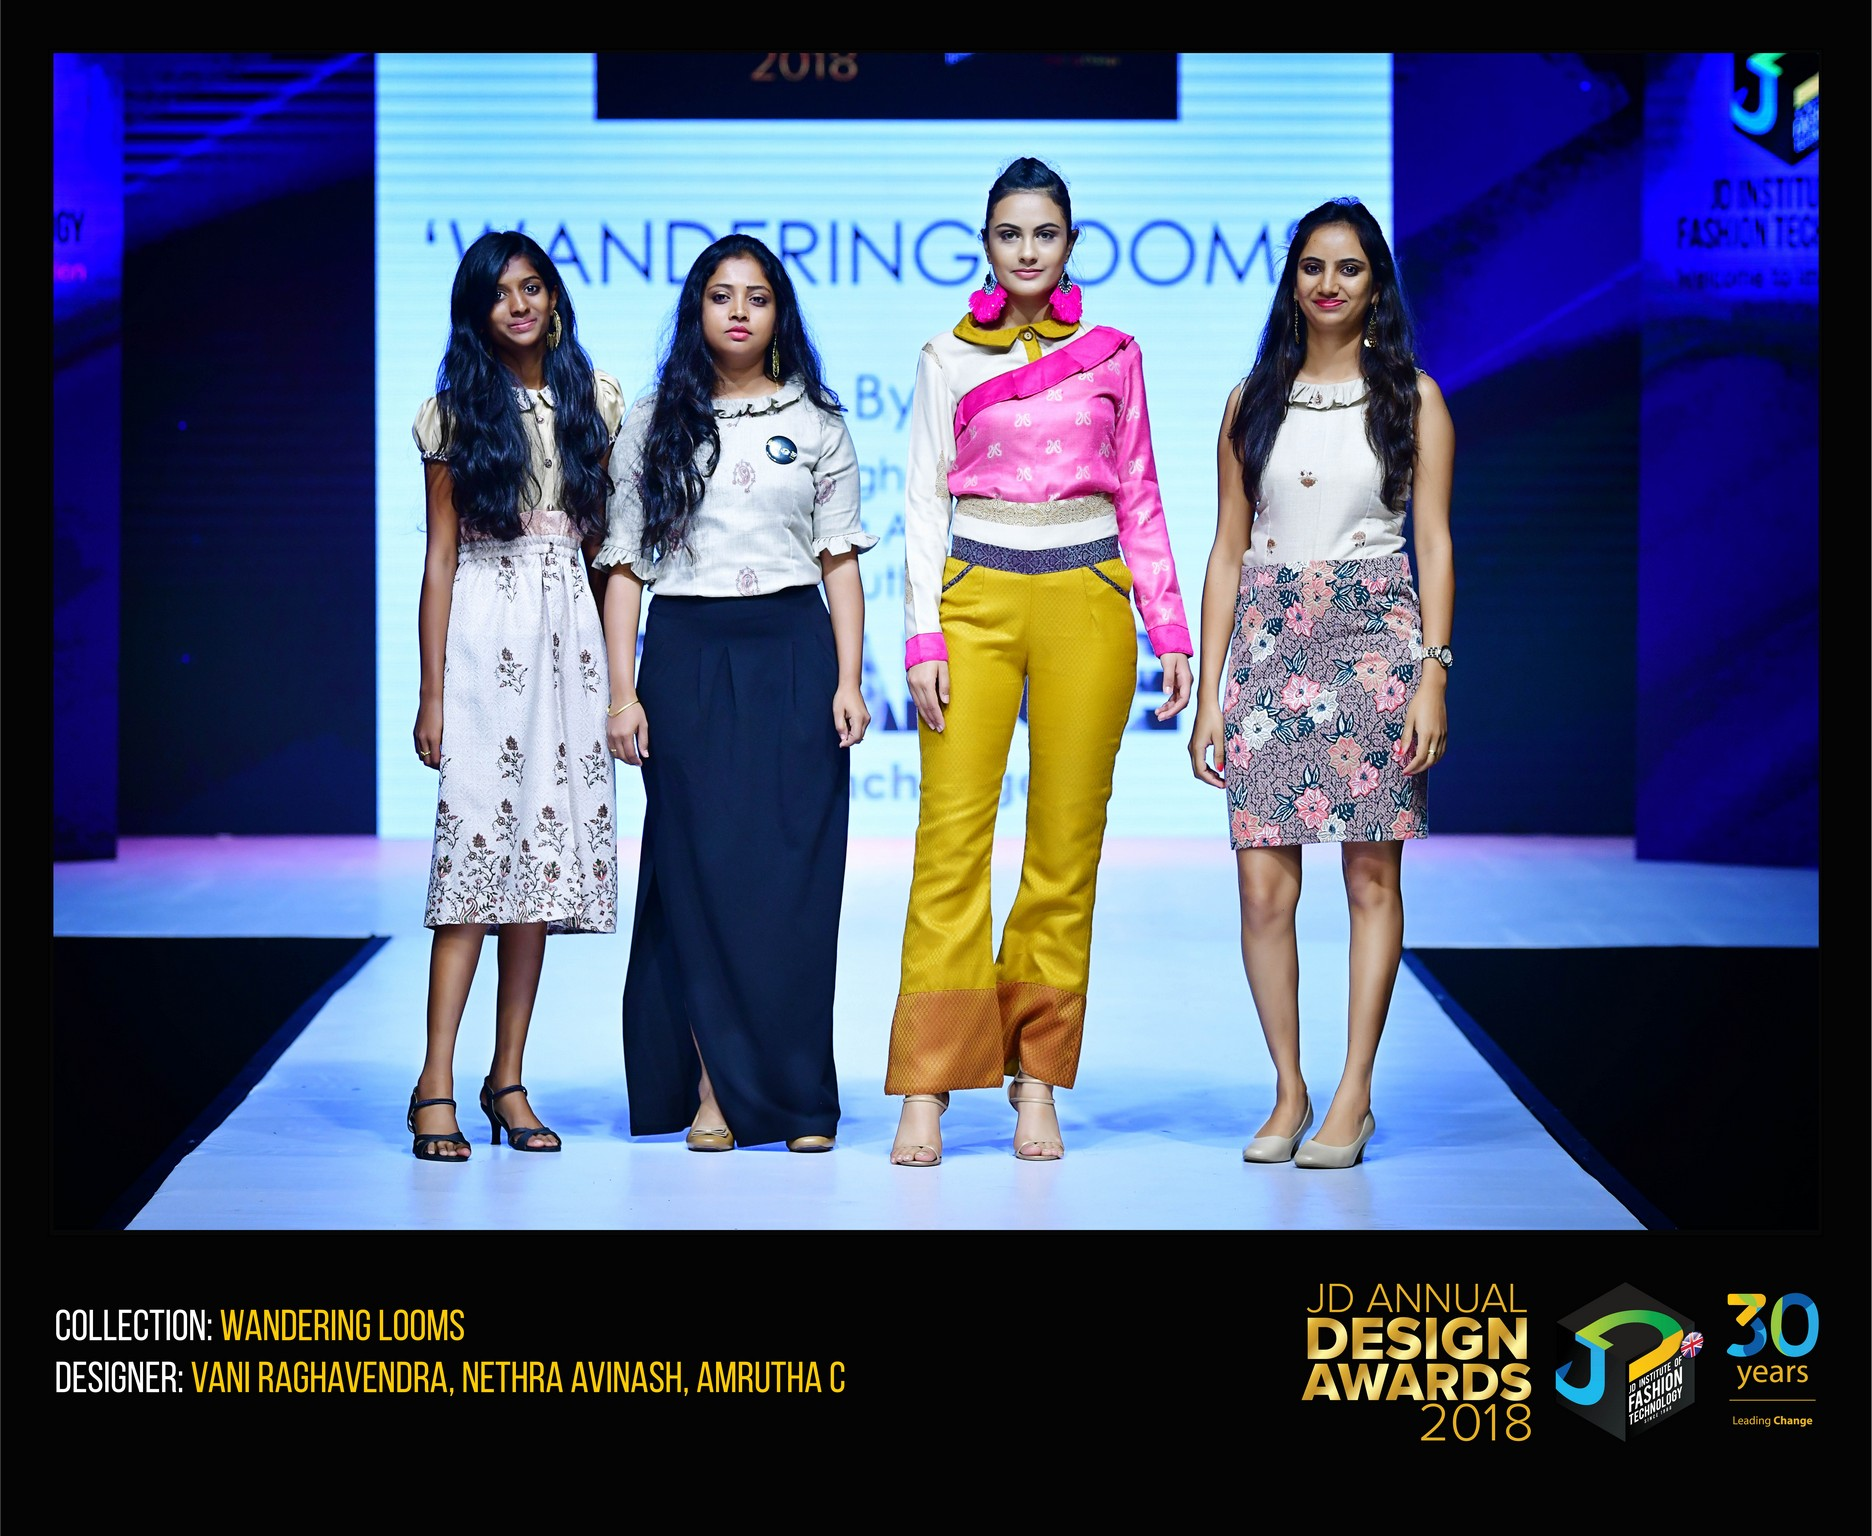 Wandering Looms – Change – JD Annual Design Awards 2018   Designer: Vani, Amrutha and Nethra   Photography : Jerin Nath (@jerin_nath) wandering looms – change – jd annual design awards 2018 Wandering Looms – Change – JD Annual Design Awards 2018 WANDERING 8